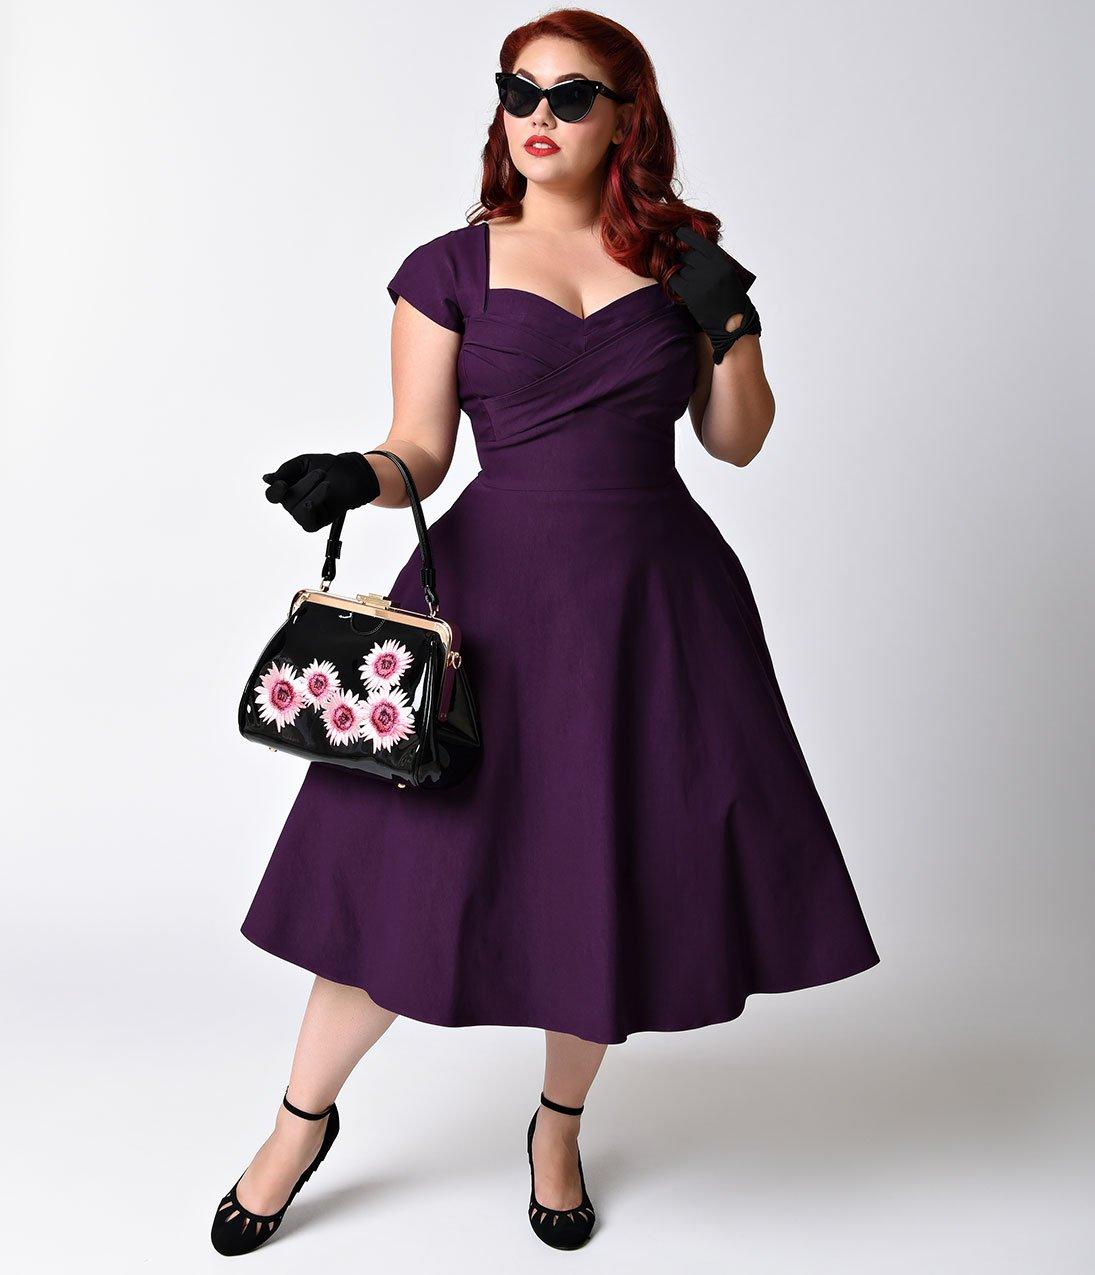 plus size dresses plus size mad style eggplant cap sleeve swing dress CHYZUCZ